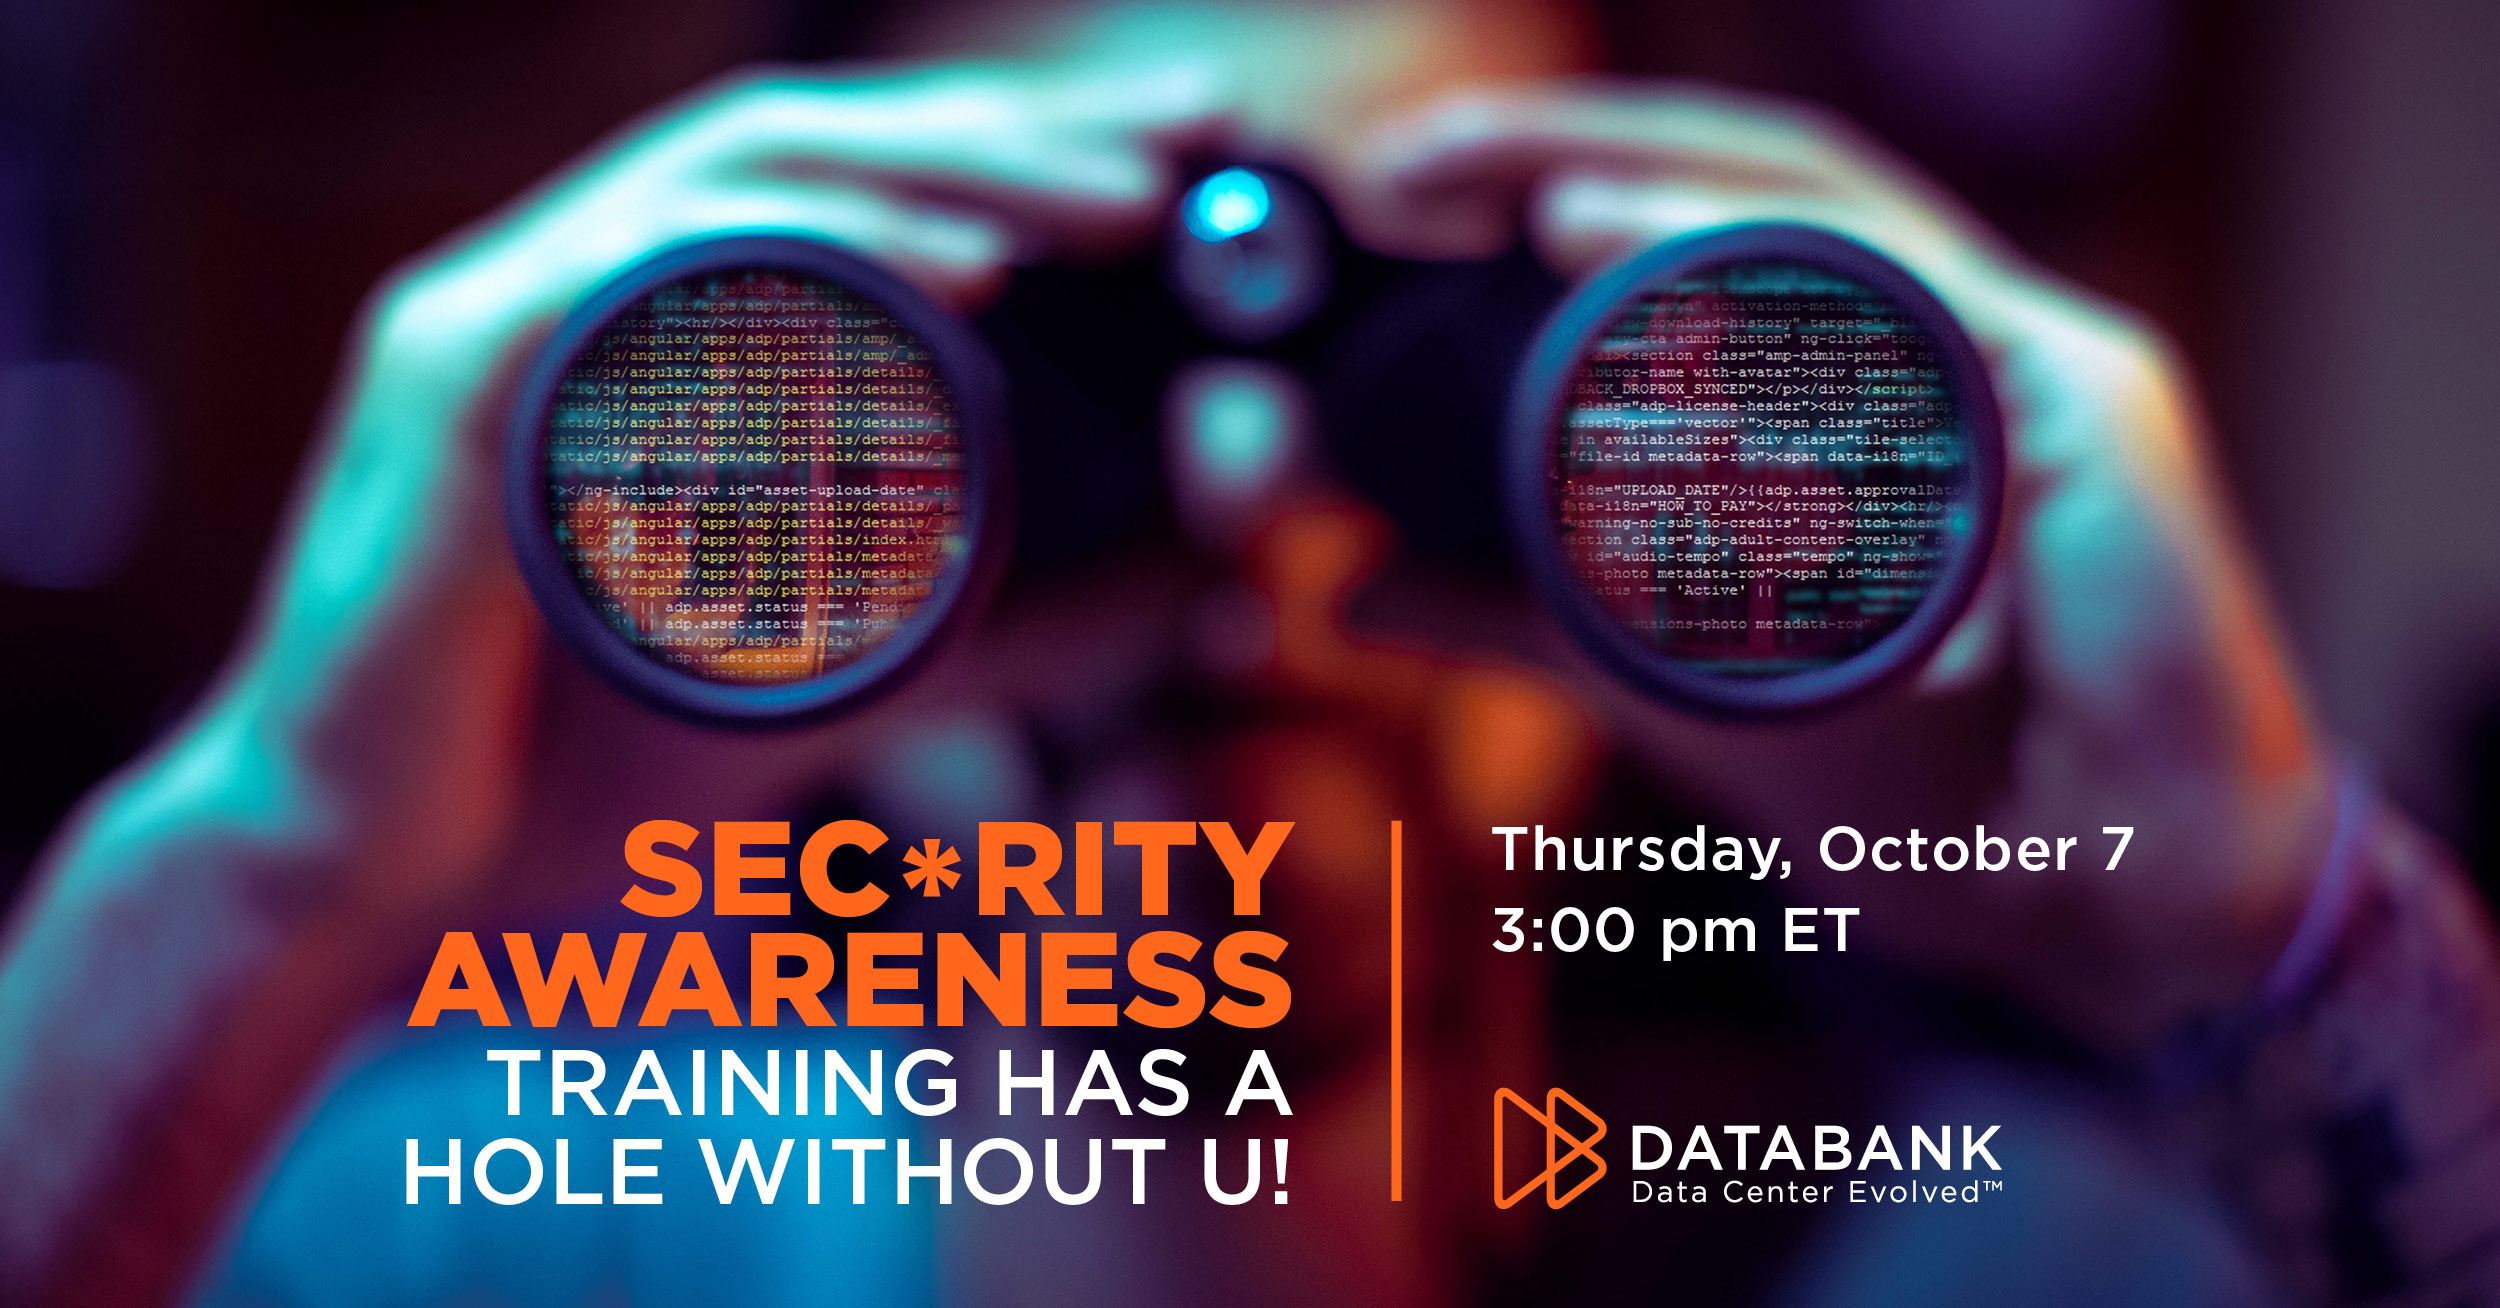 DataBank's Security Awareness Webinar